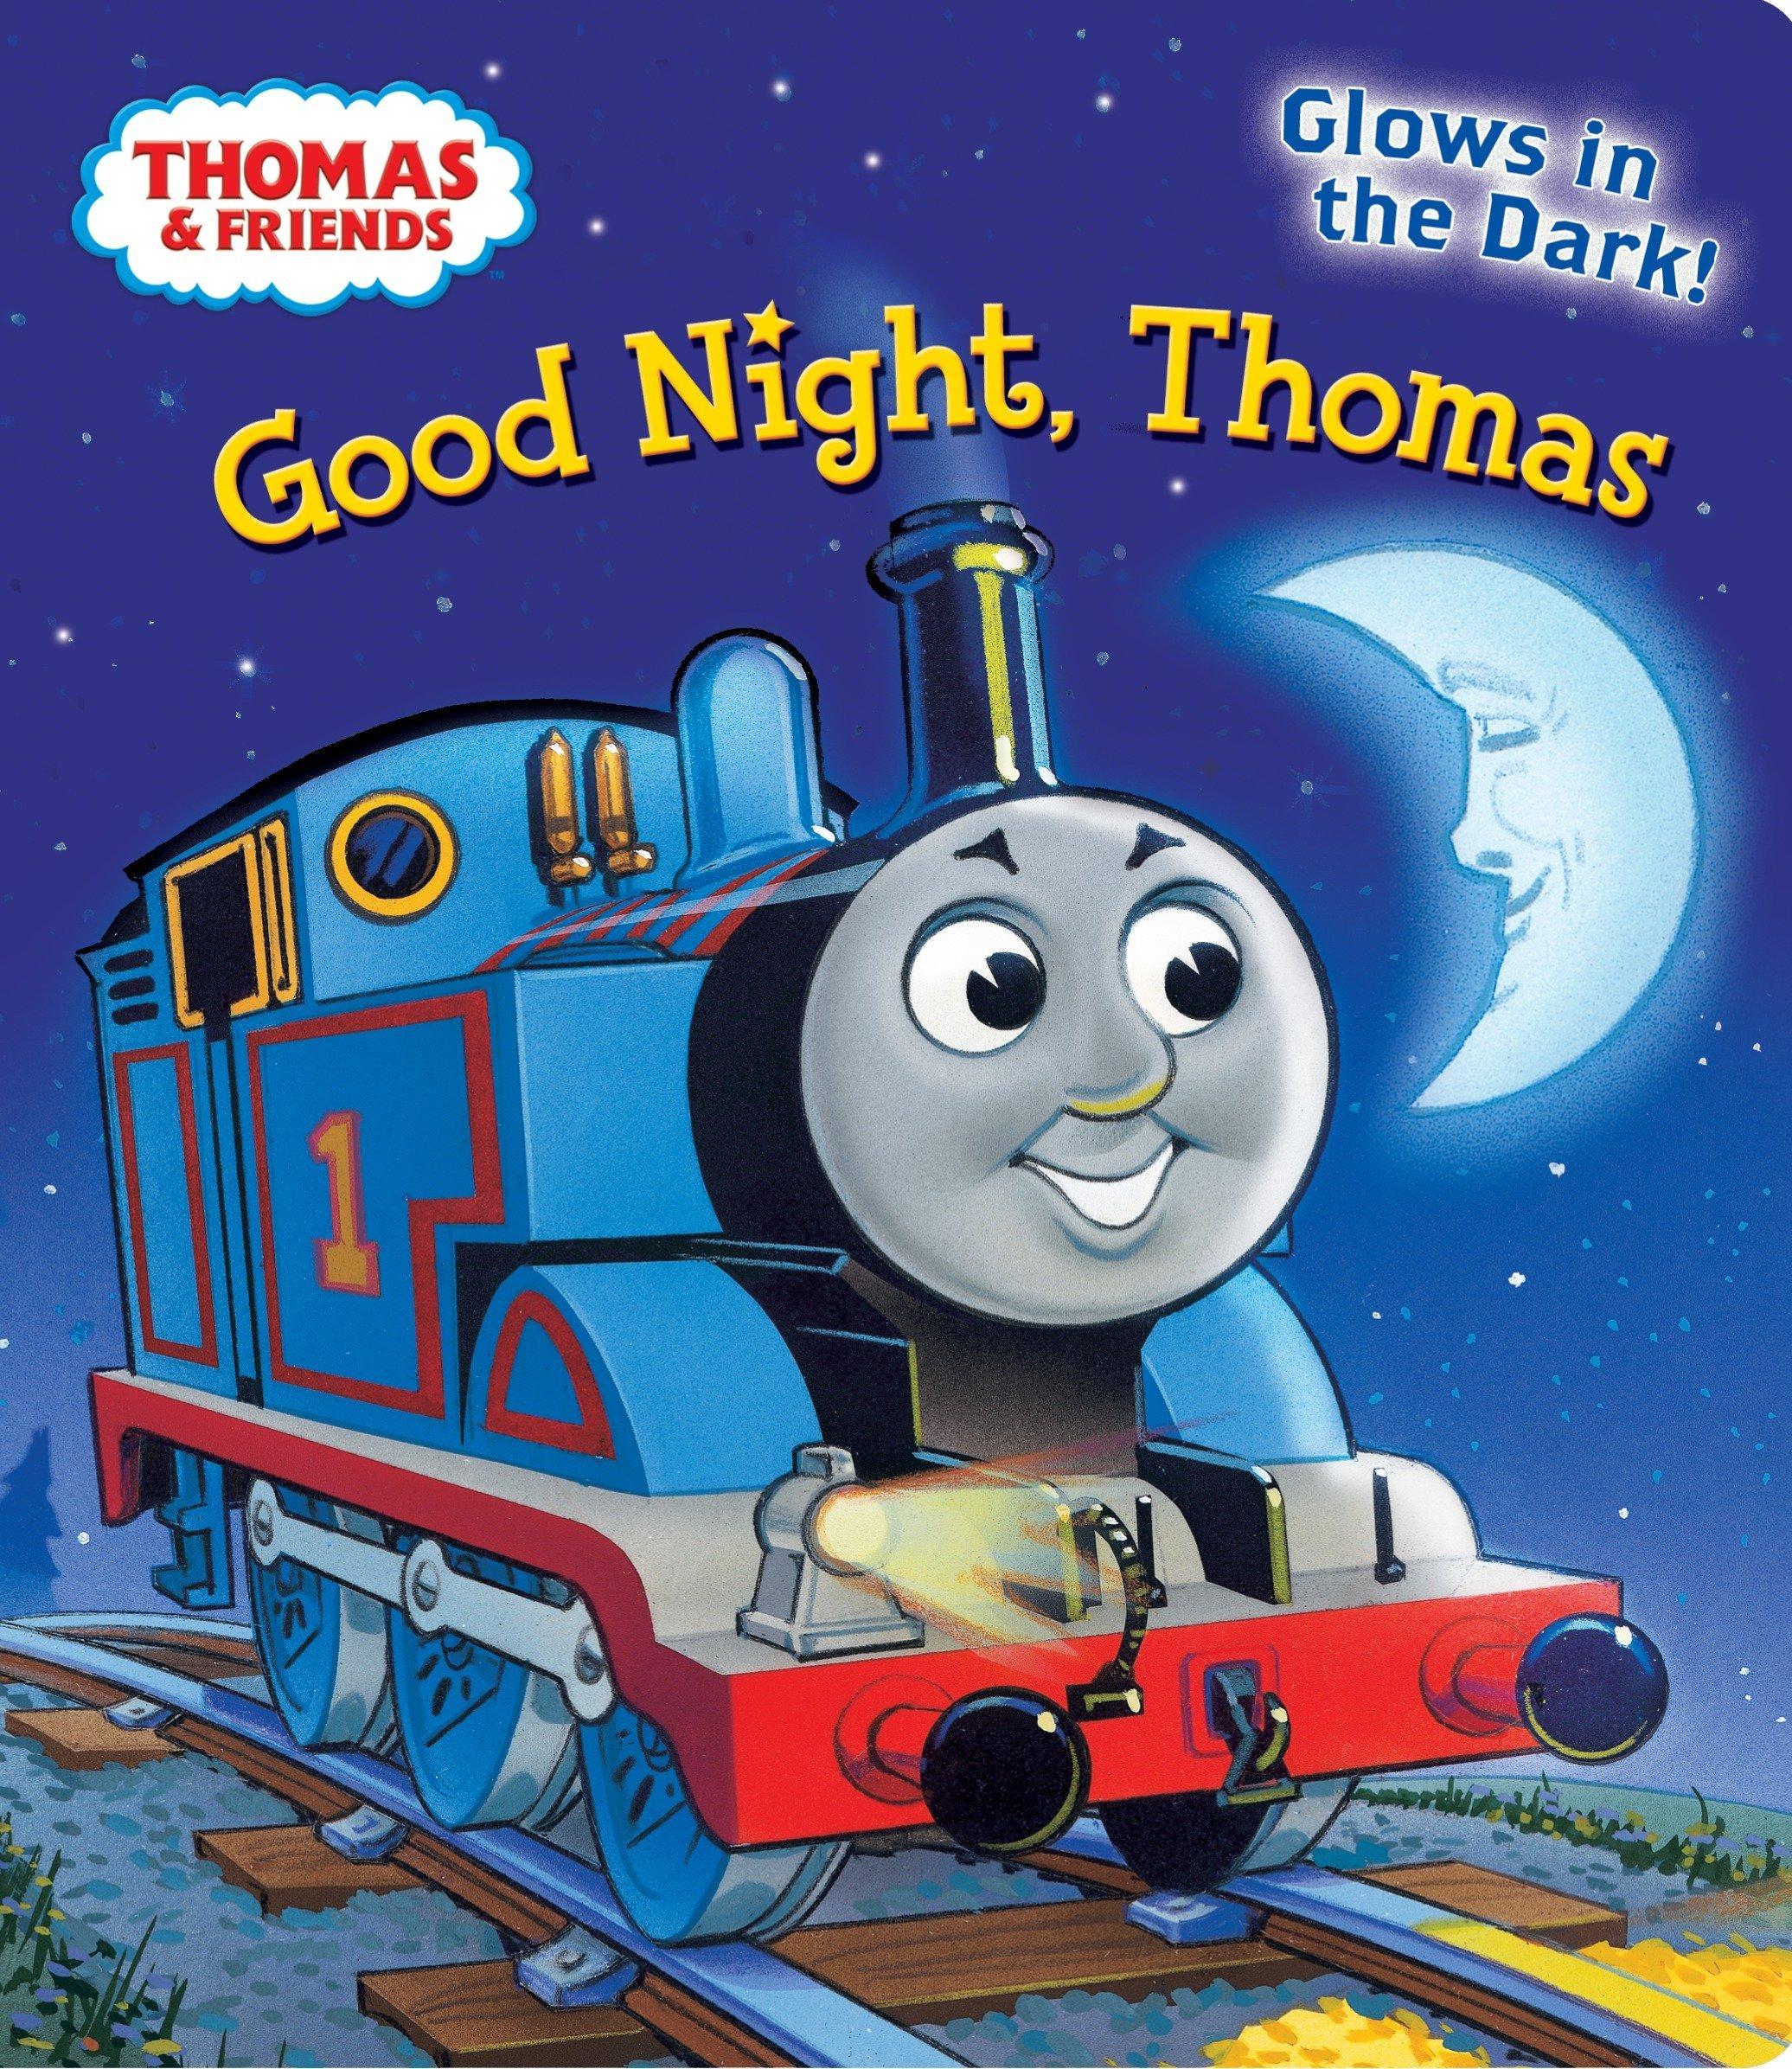 GOOD NIGHT,THOMAS-GL Board book – August 7, 2012 Rev. W. Awdry Random House 0307976971 Board books